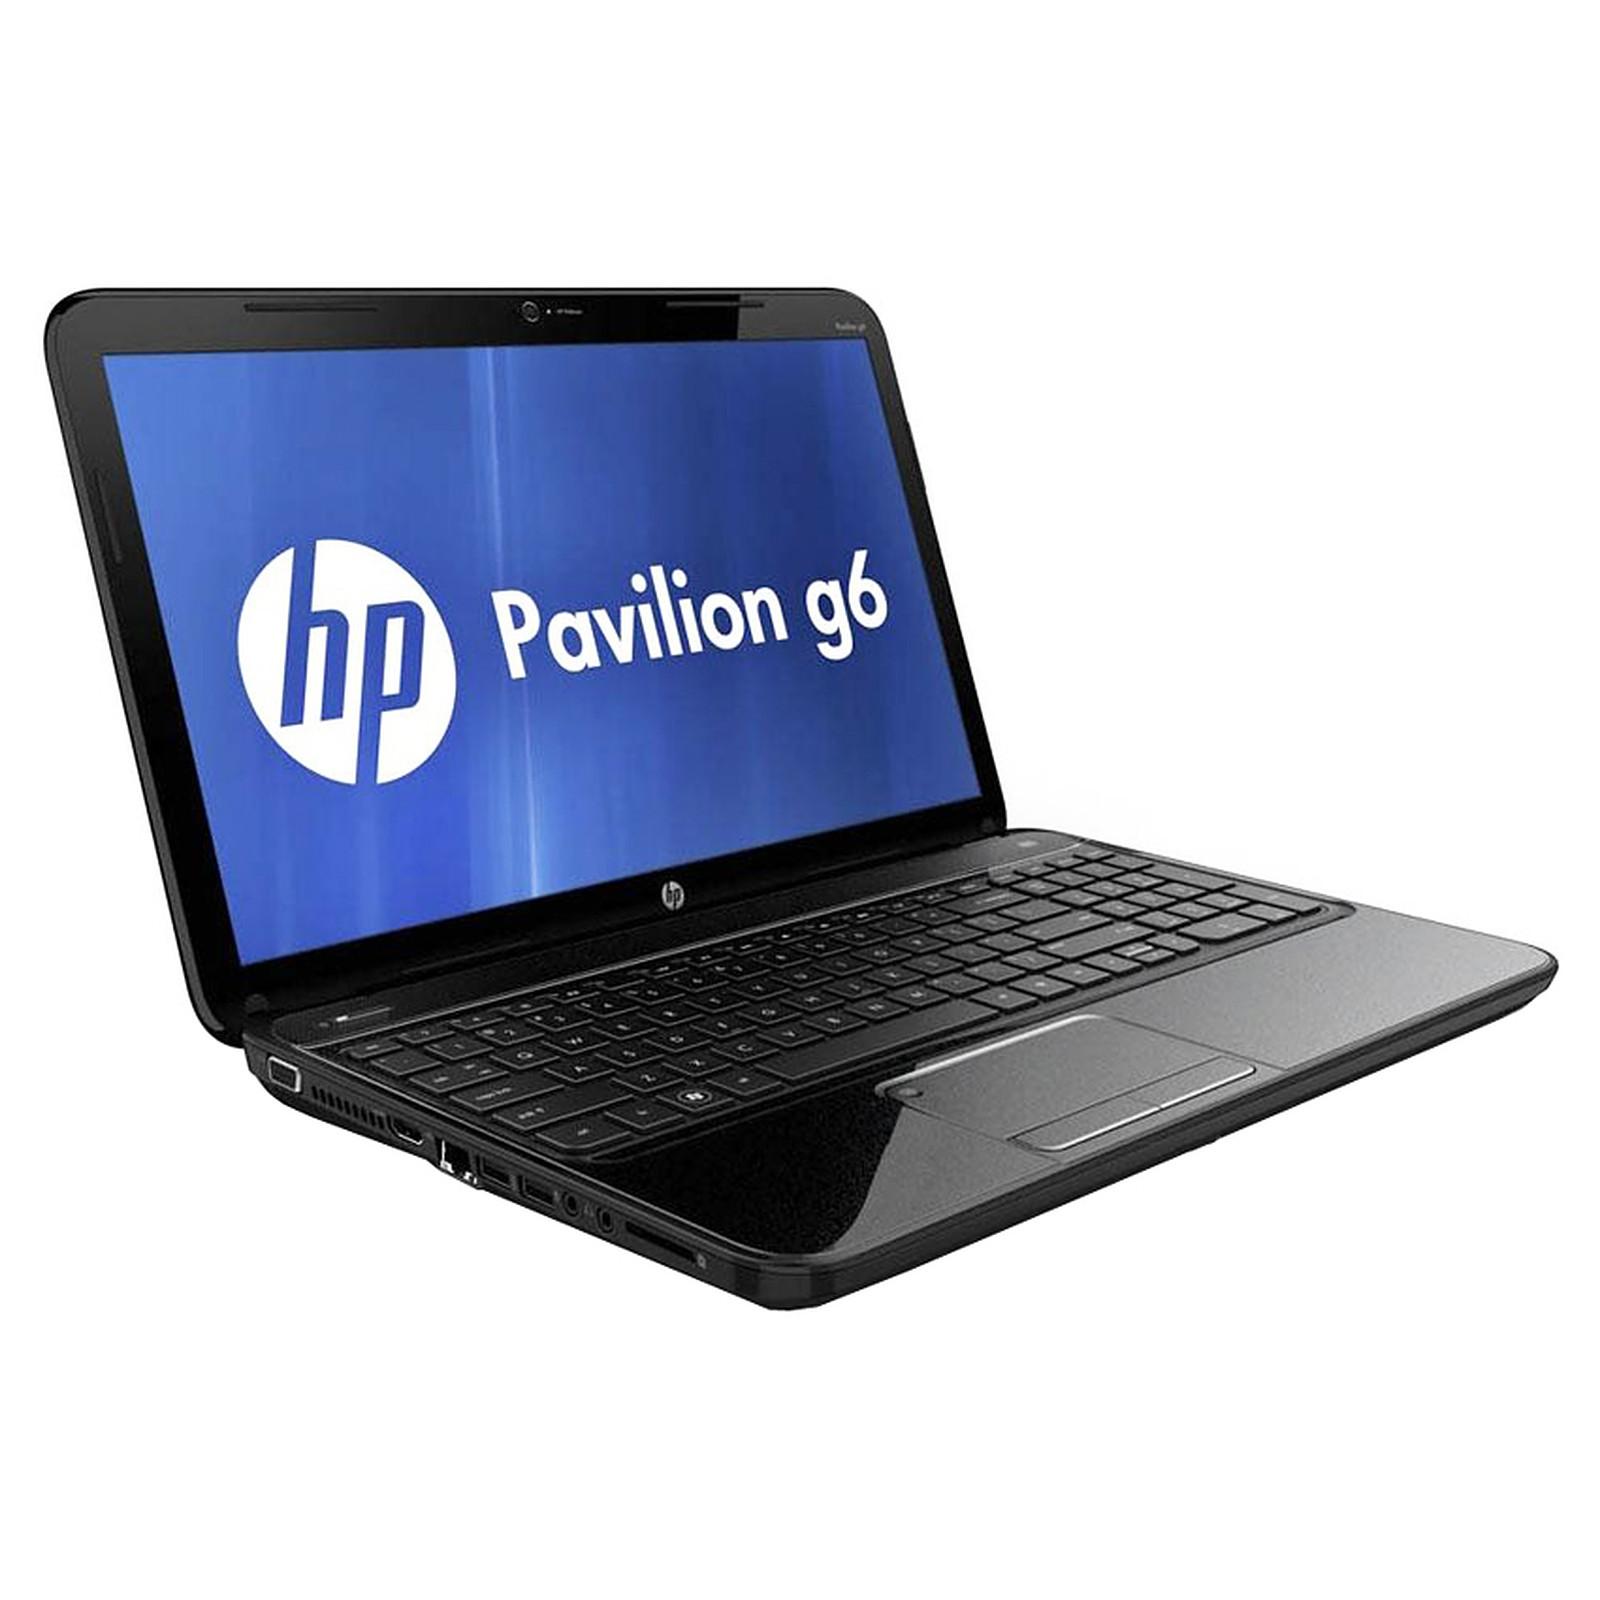 HP Pavilion g6-2054sf (B1S05EA)